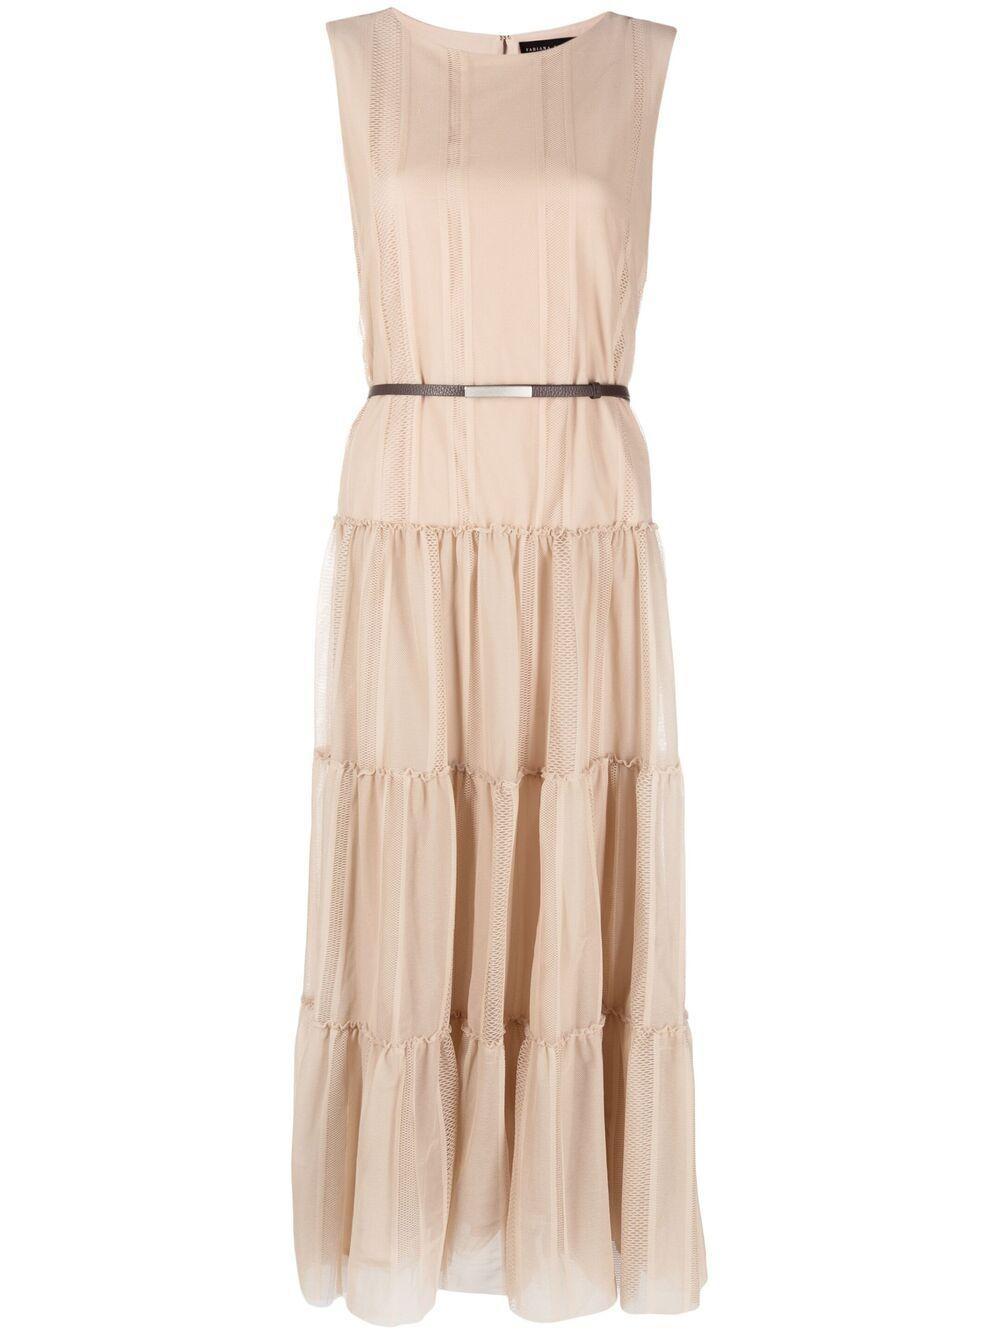 Tiered Cotton Tulle Dress Item # ABD271B696